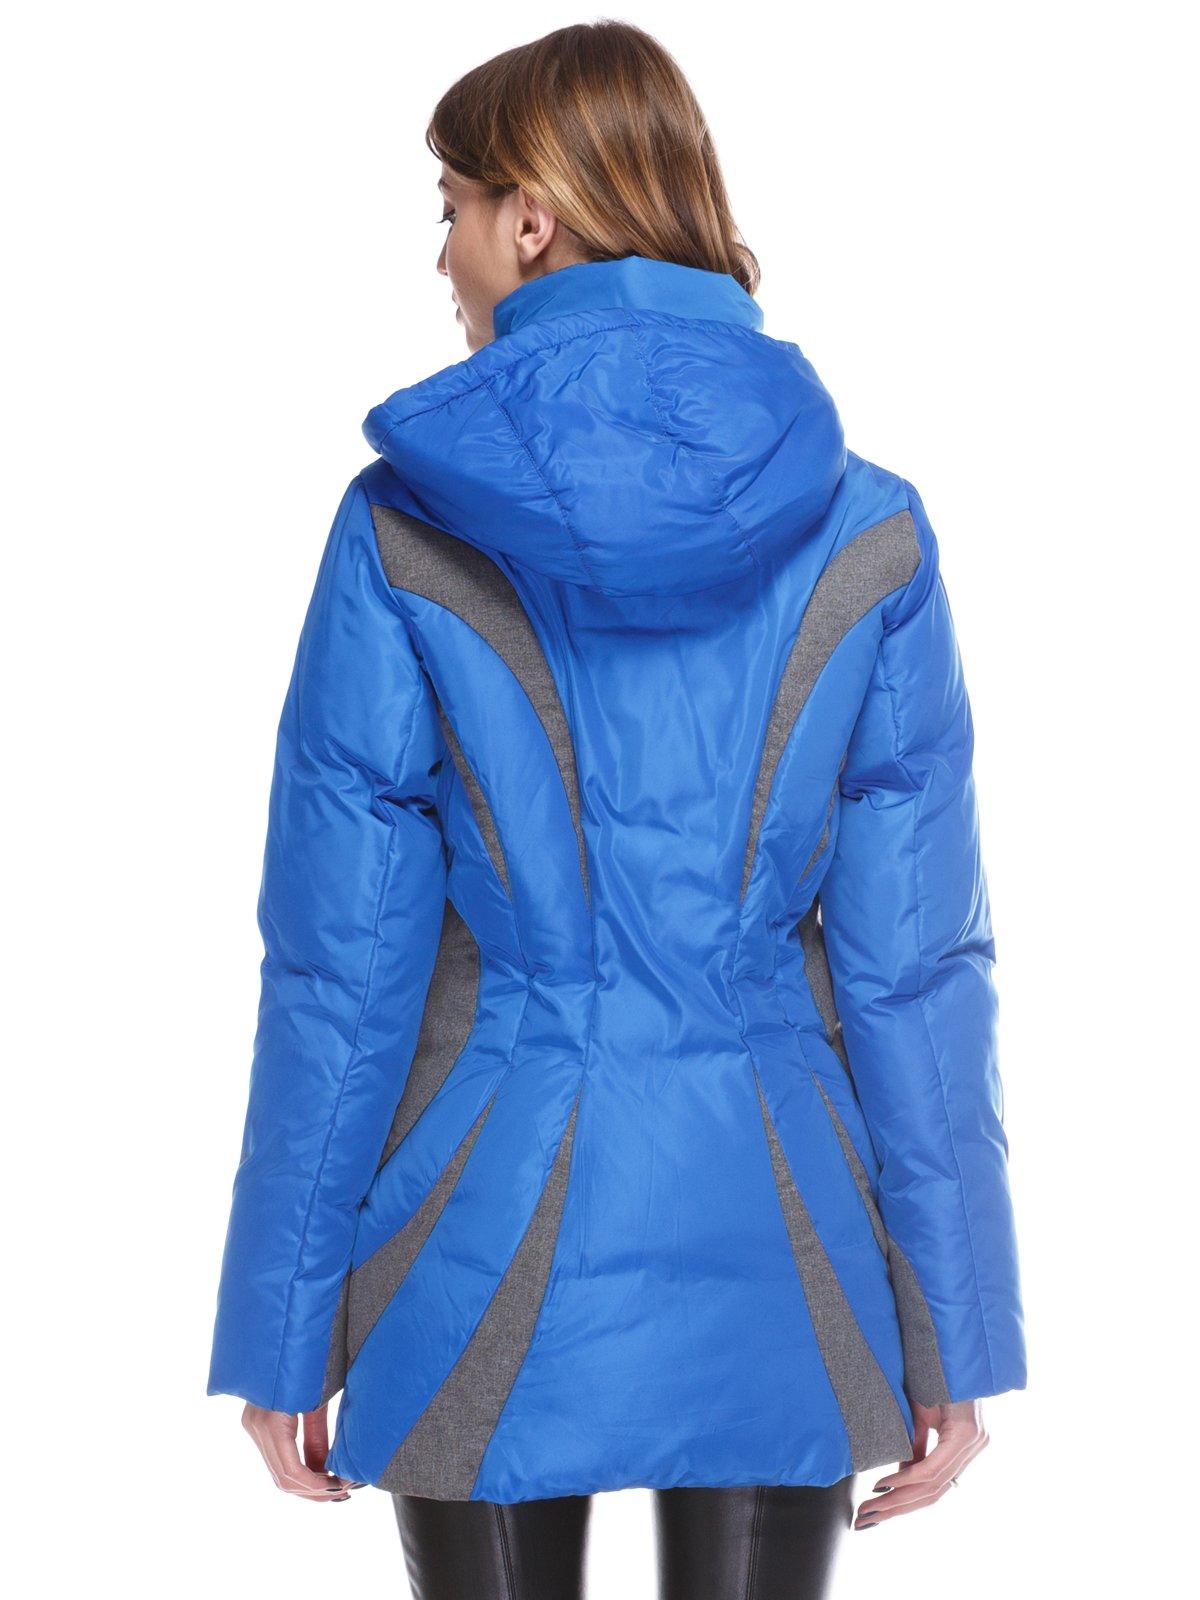 Пальто синее | 3845058 | фото 2